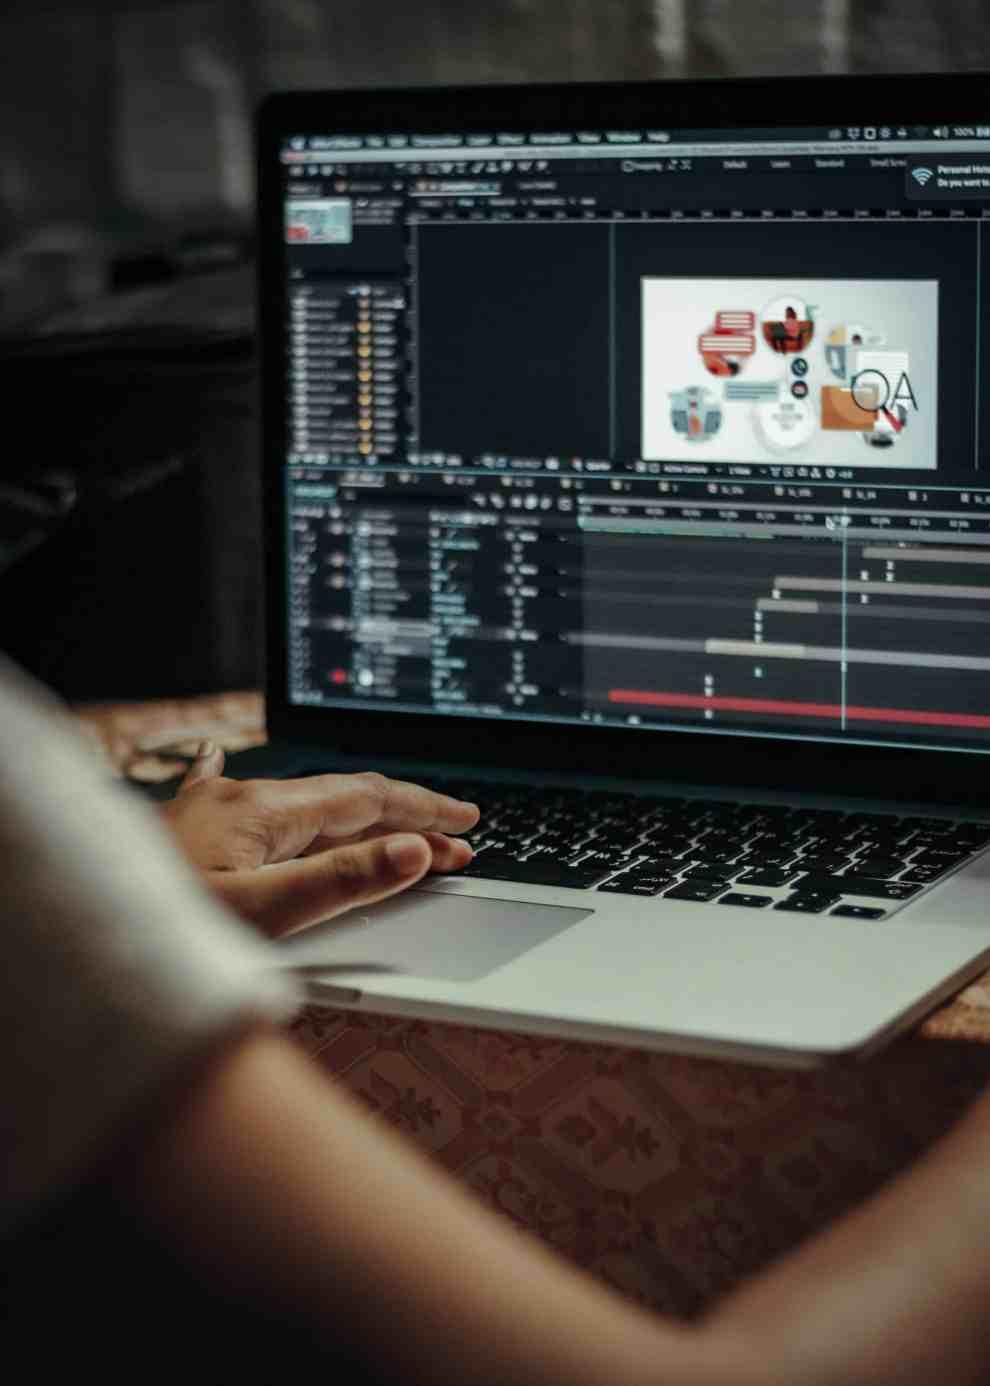 Production for animated videos sarath p raj